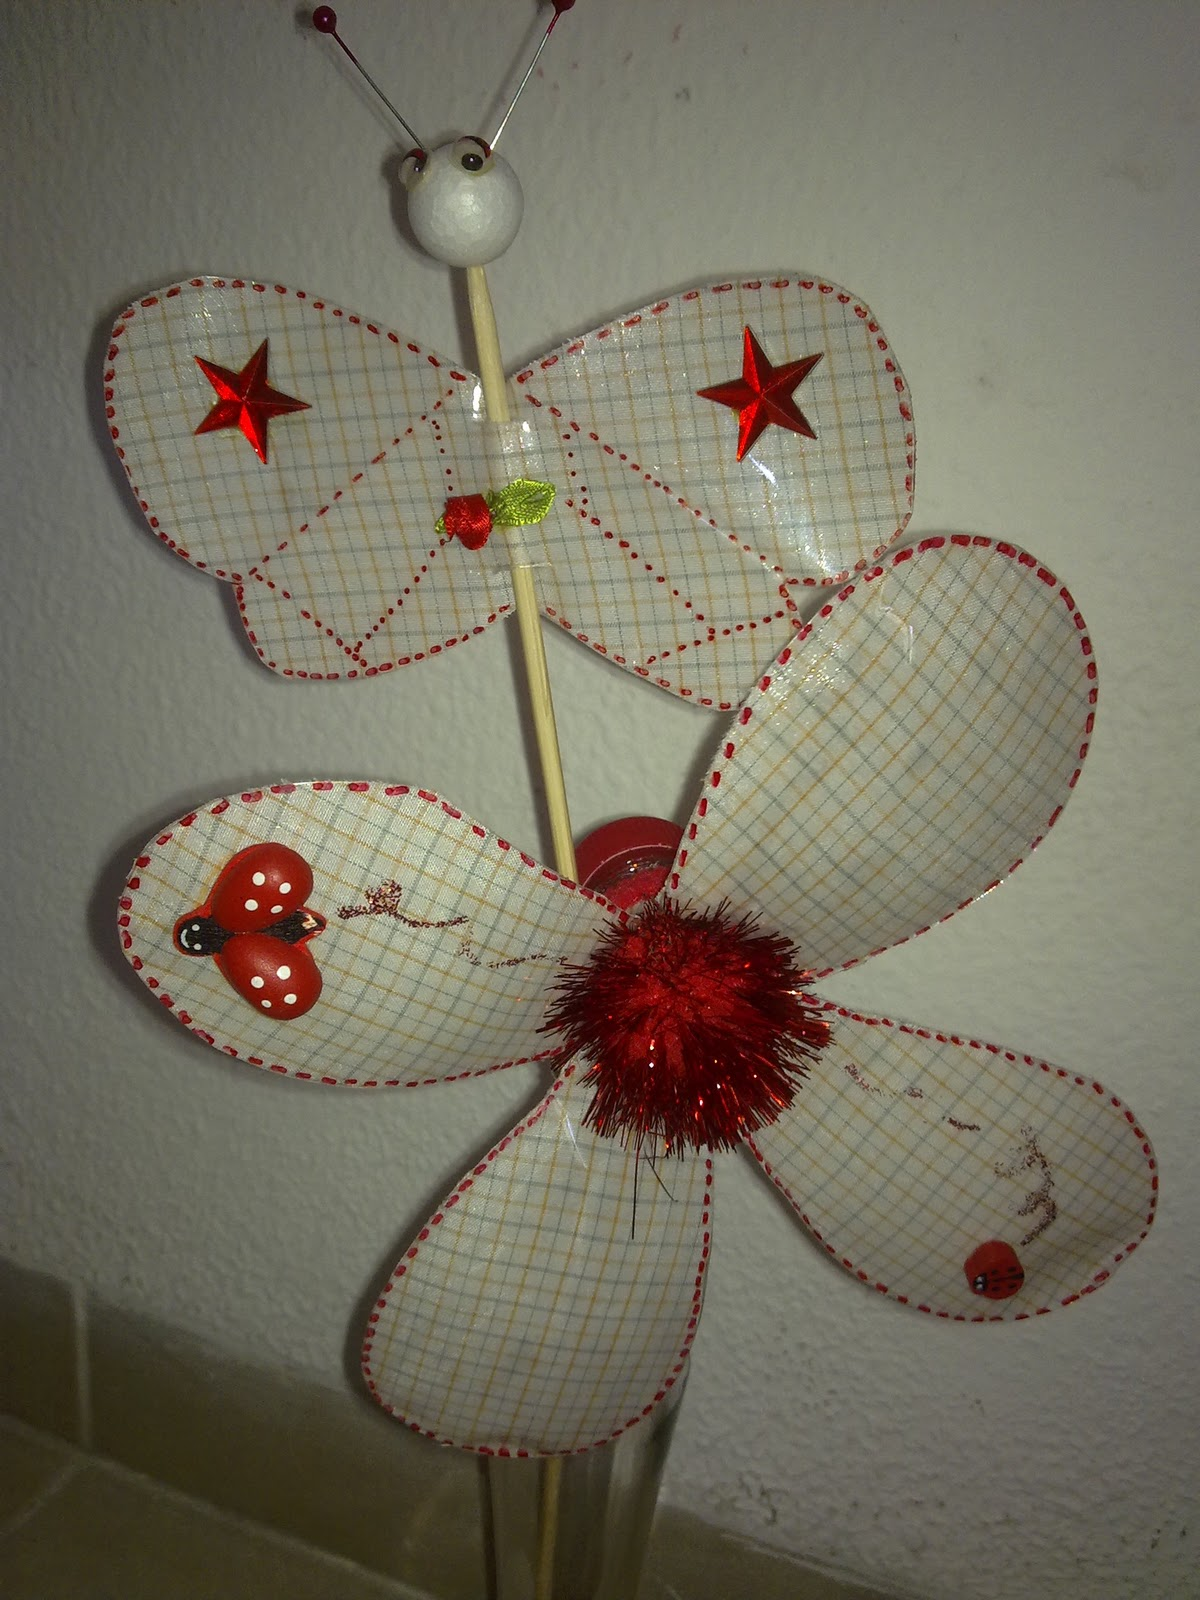 Armario Lavanderia ~ Arte em miçangas Flor de garrafa pet no programa artesanato do SABOR DE VIDA